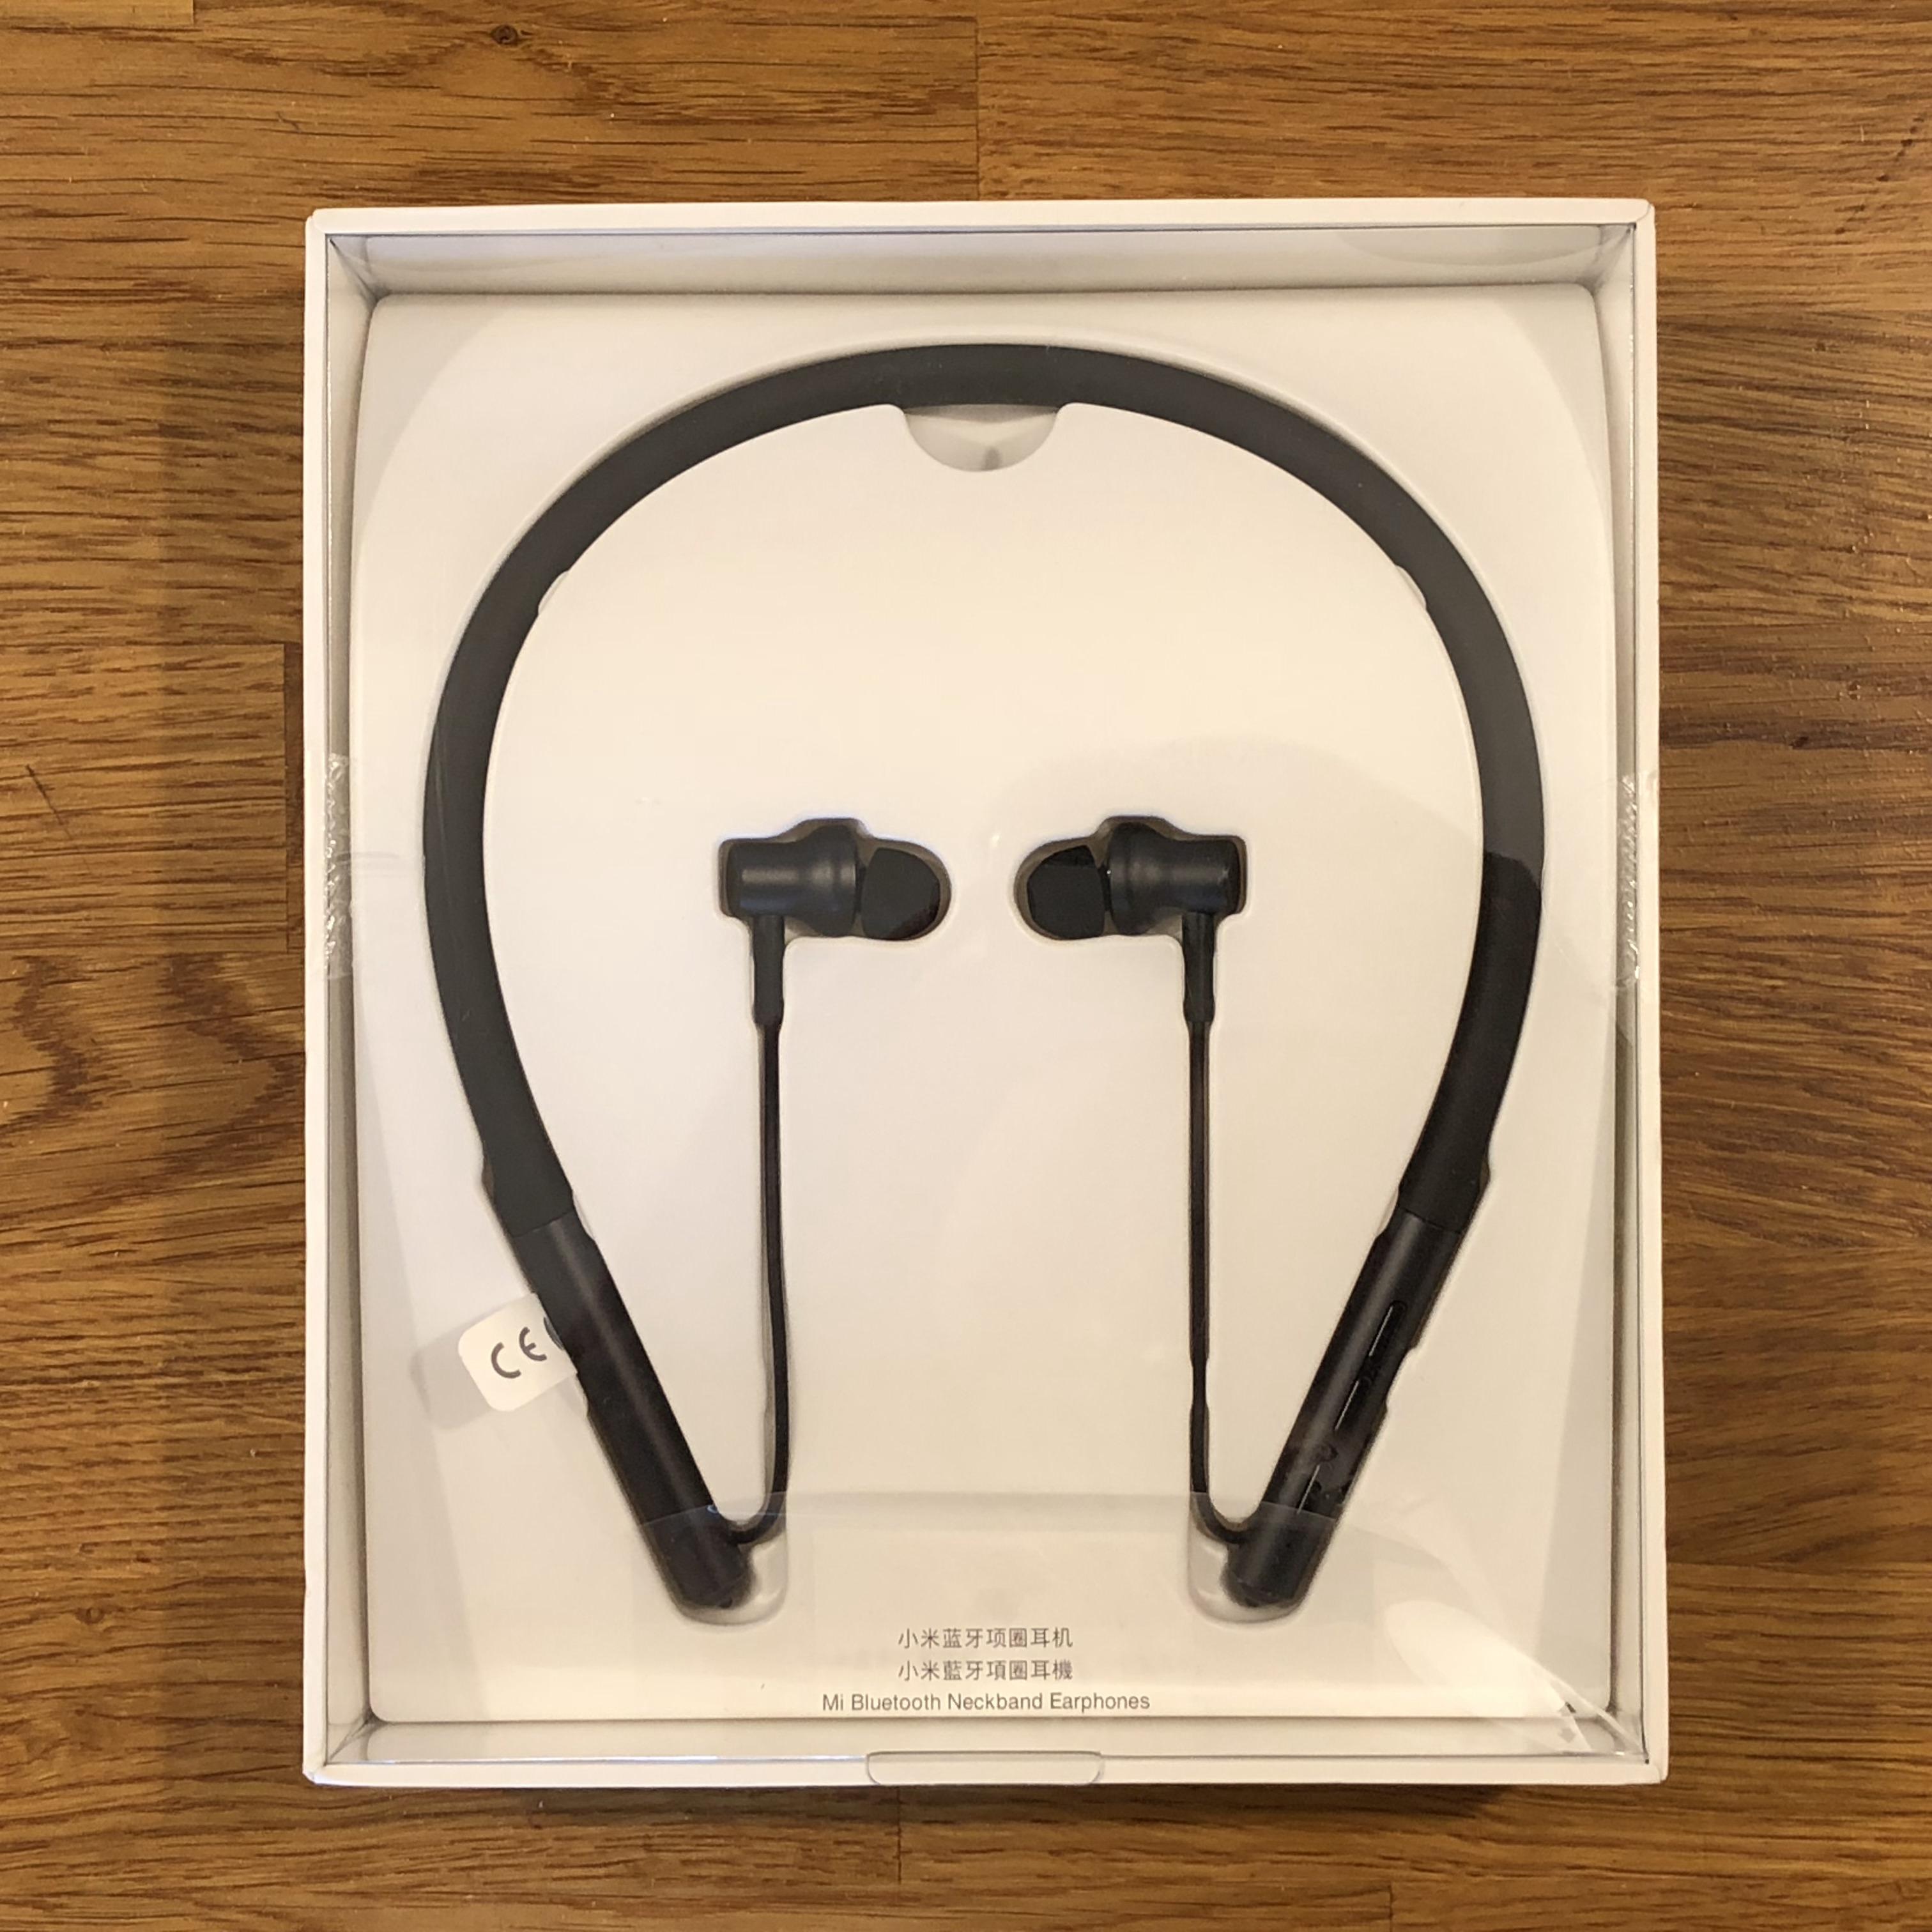 Mi Bluetooth Neckband Earphone